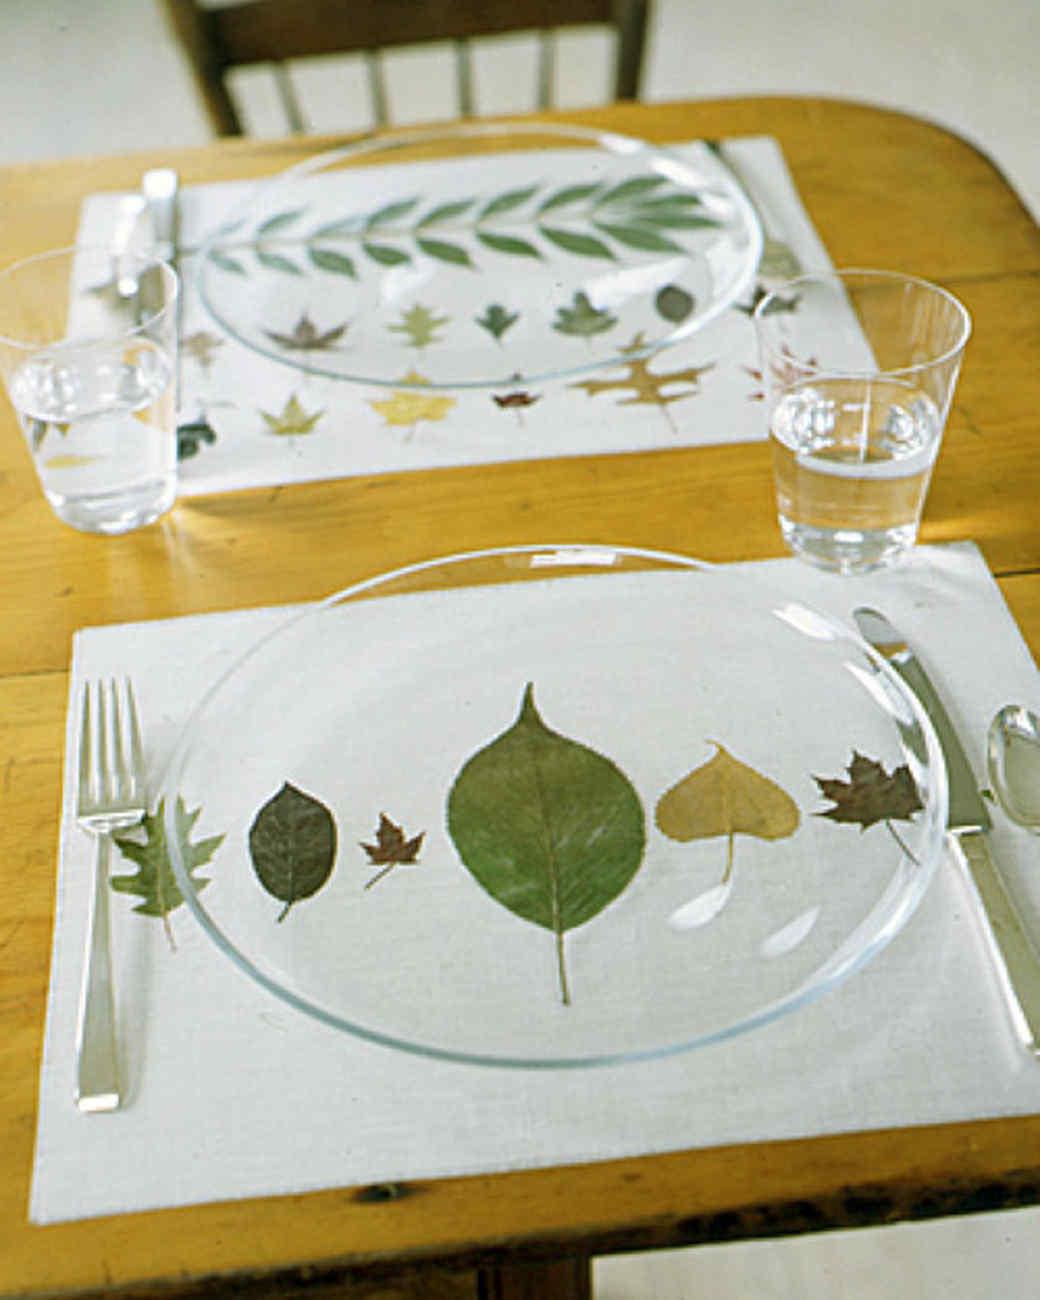 Pressed-Leaf Place Mats